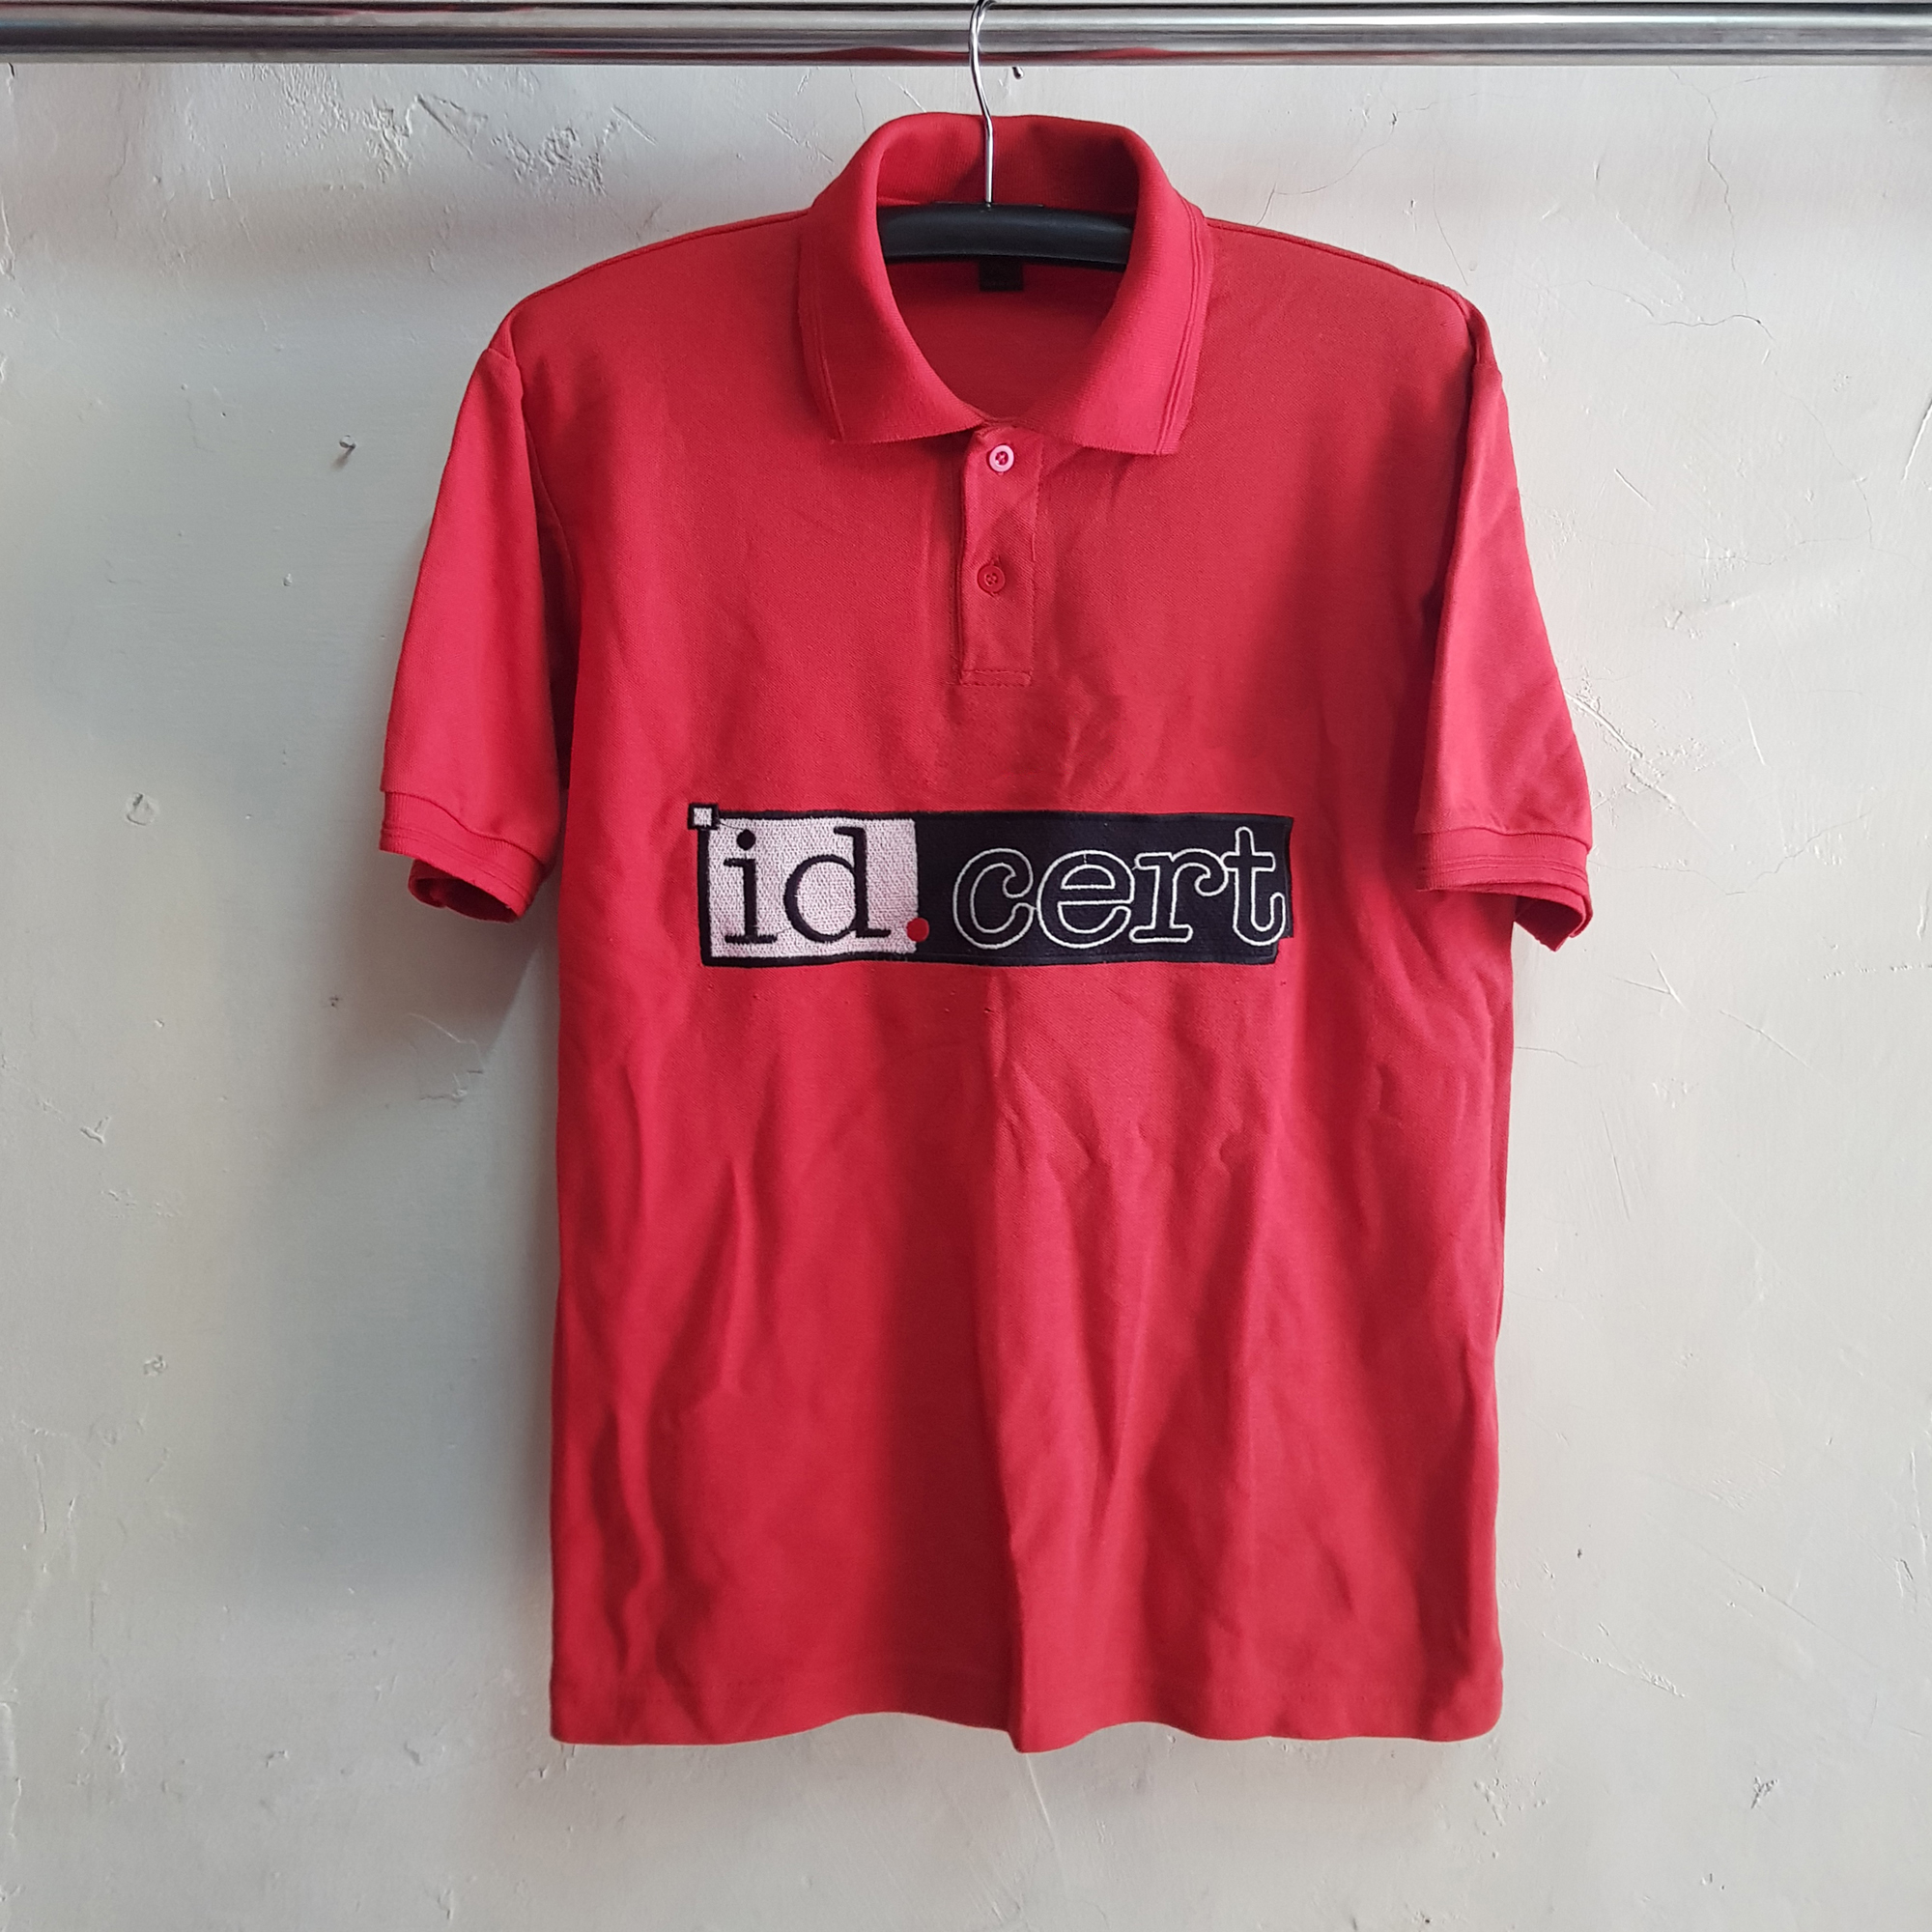 Poloshirt Id Cert, Poloshirt Lacoste Cotton